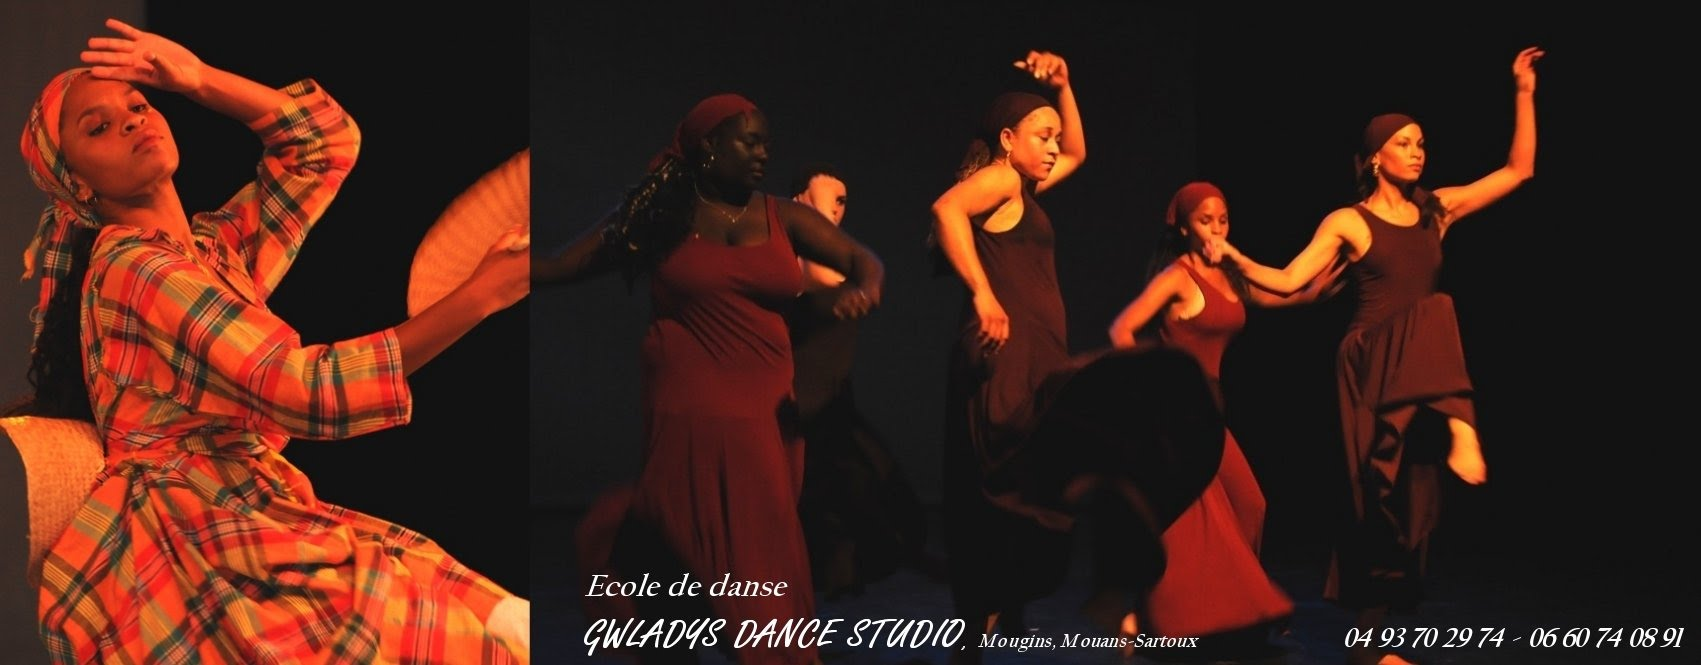 baniere-gwladys-dance-studio-texte